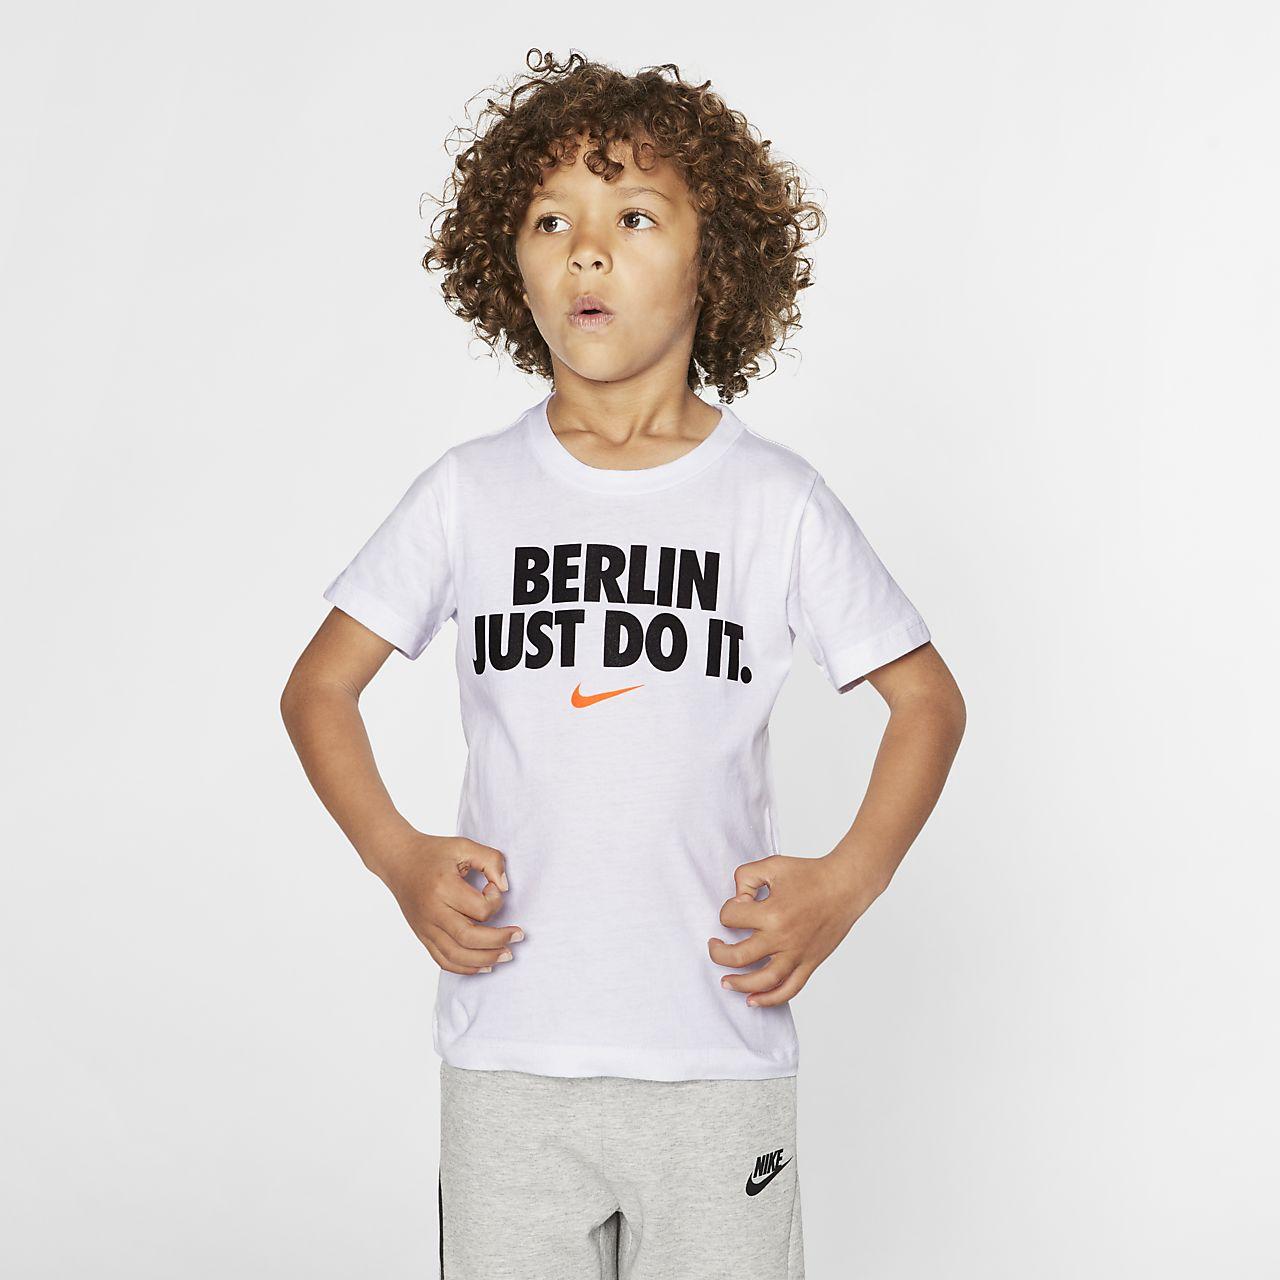 Tee Enfant Pour Be Nike Shirt Jdi Jeune rqTPr